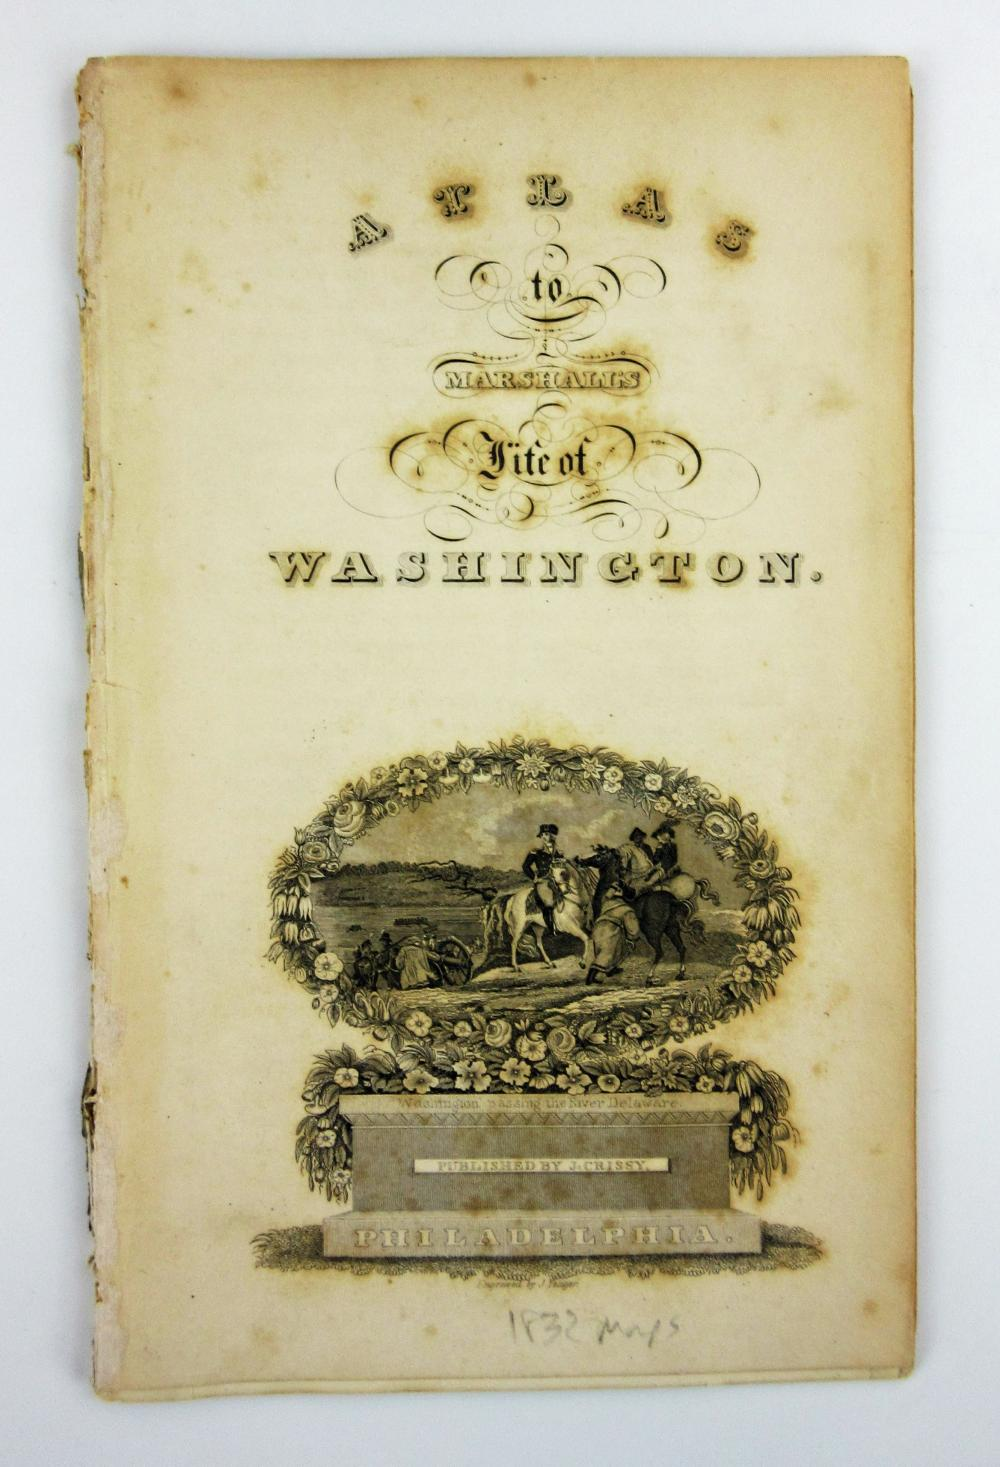 Marshall's Life of Washington, Best English Edition, 5 Quarto Volumes With Folding Maps & Plates